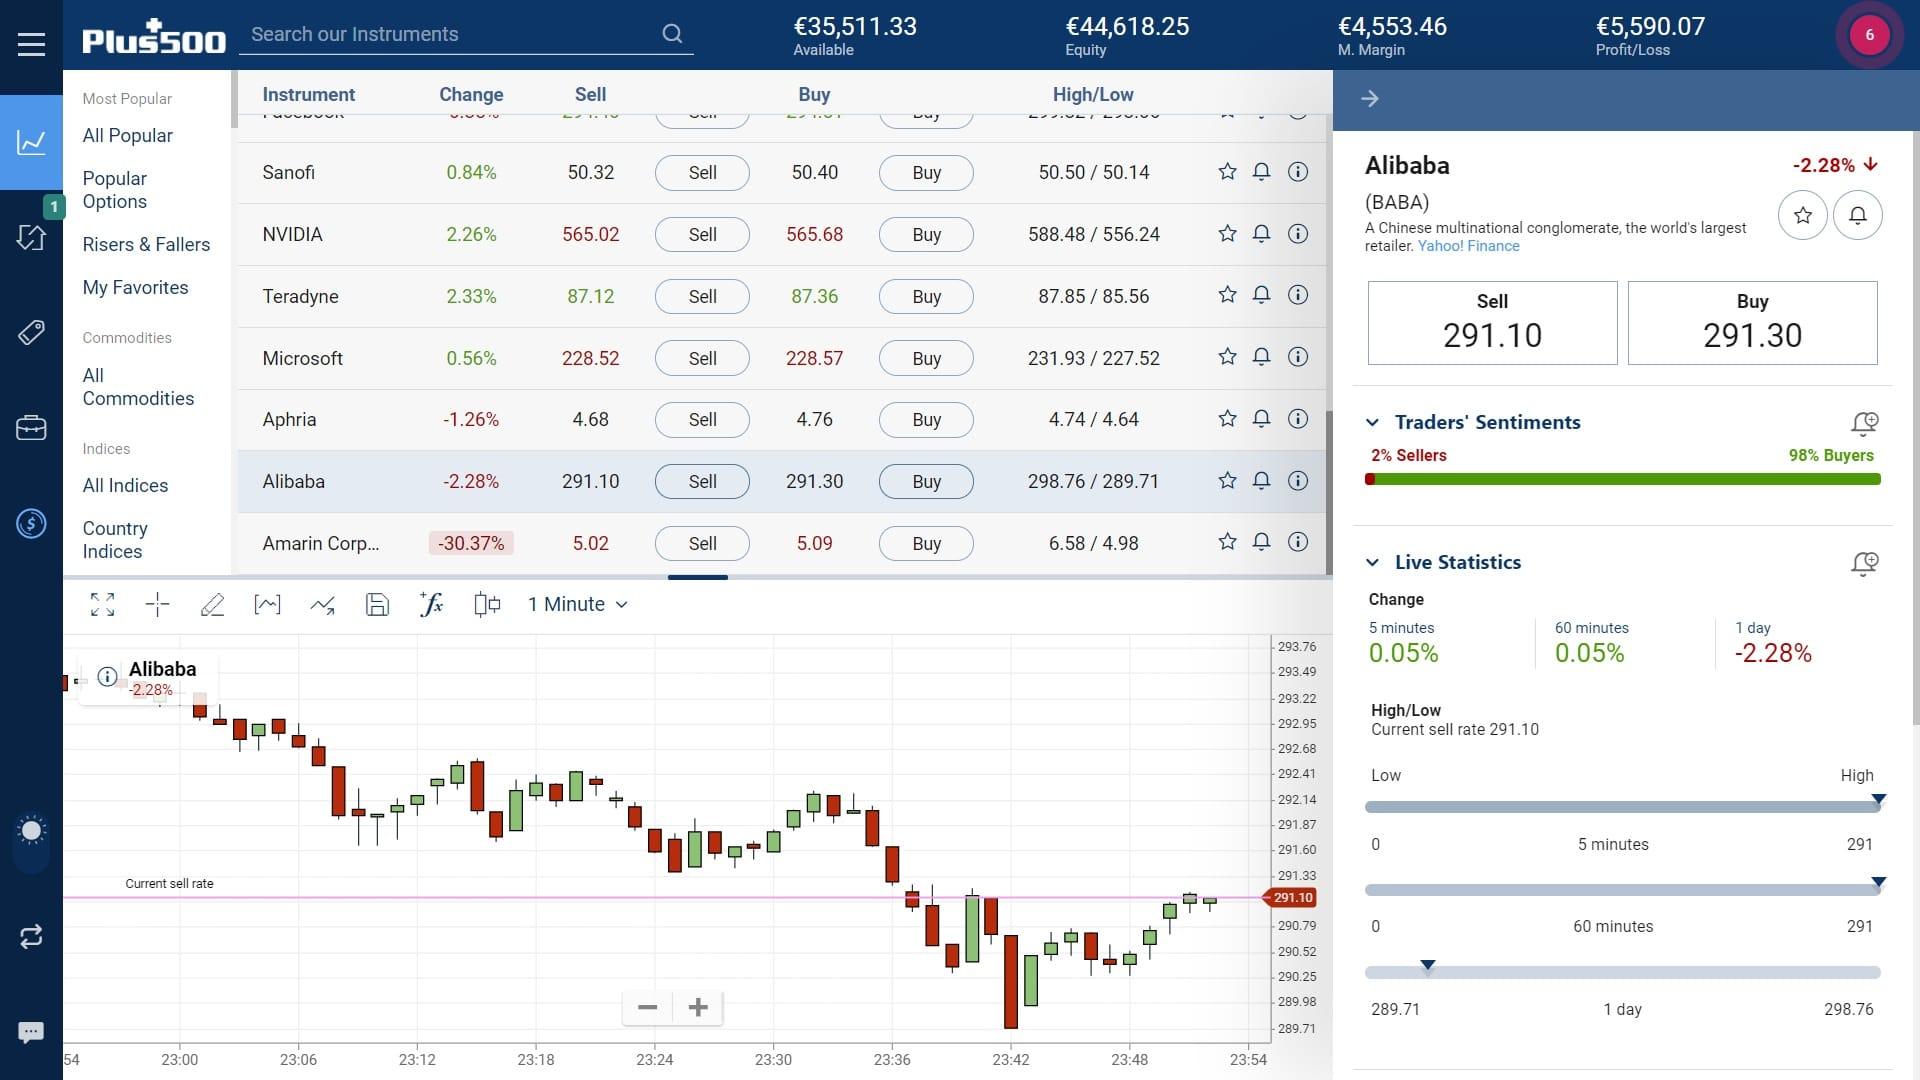 Alibaba stock trading on Plus500's WebTrader platform